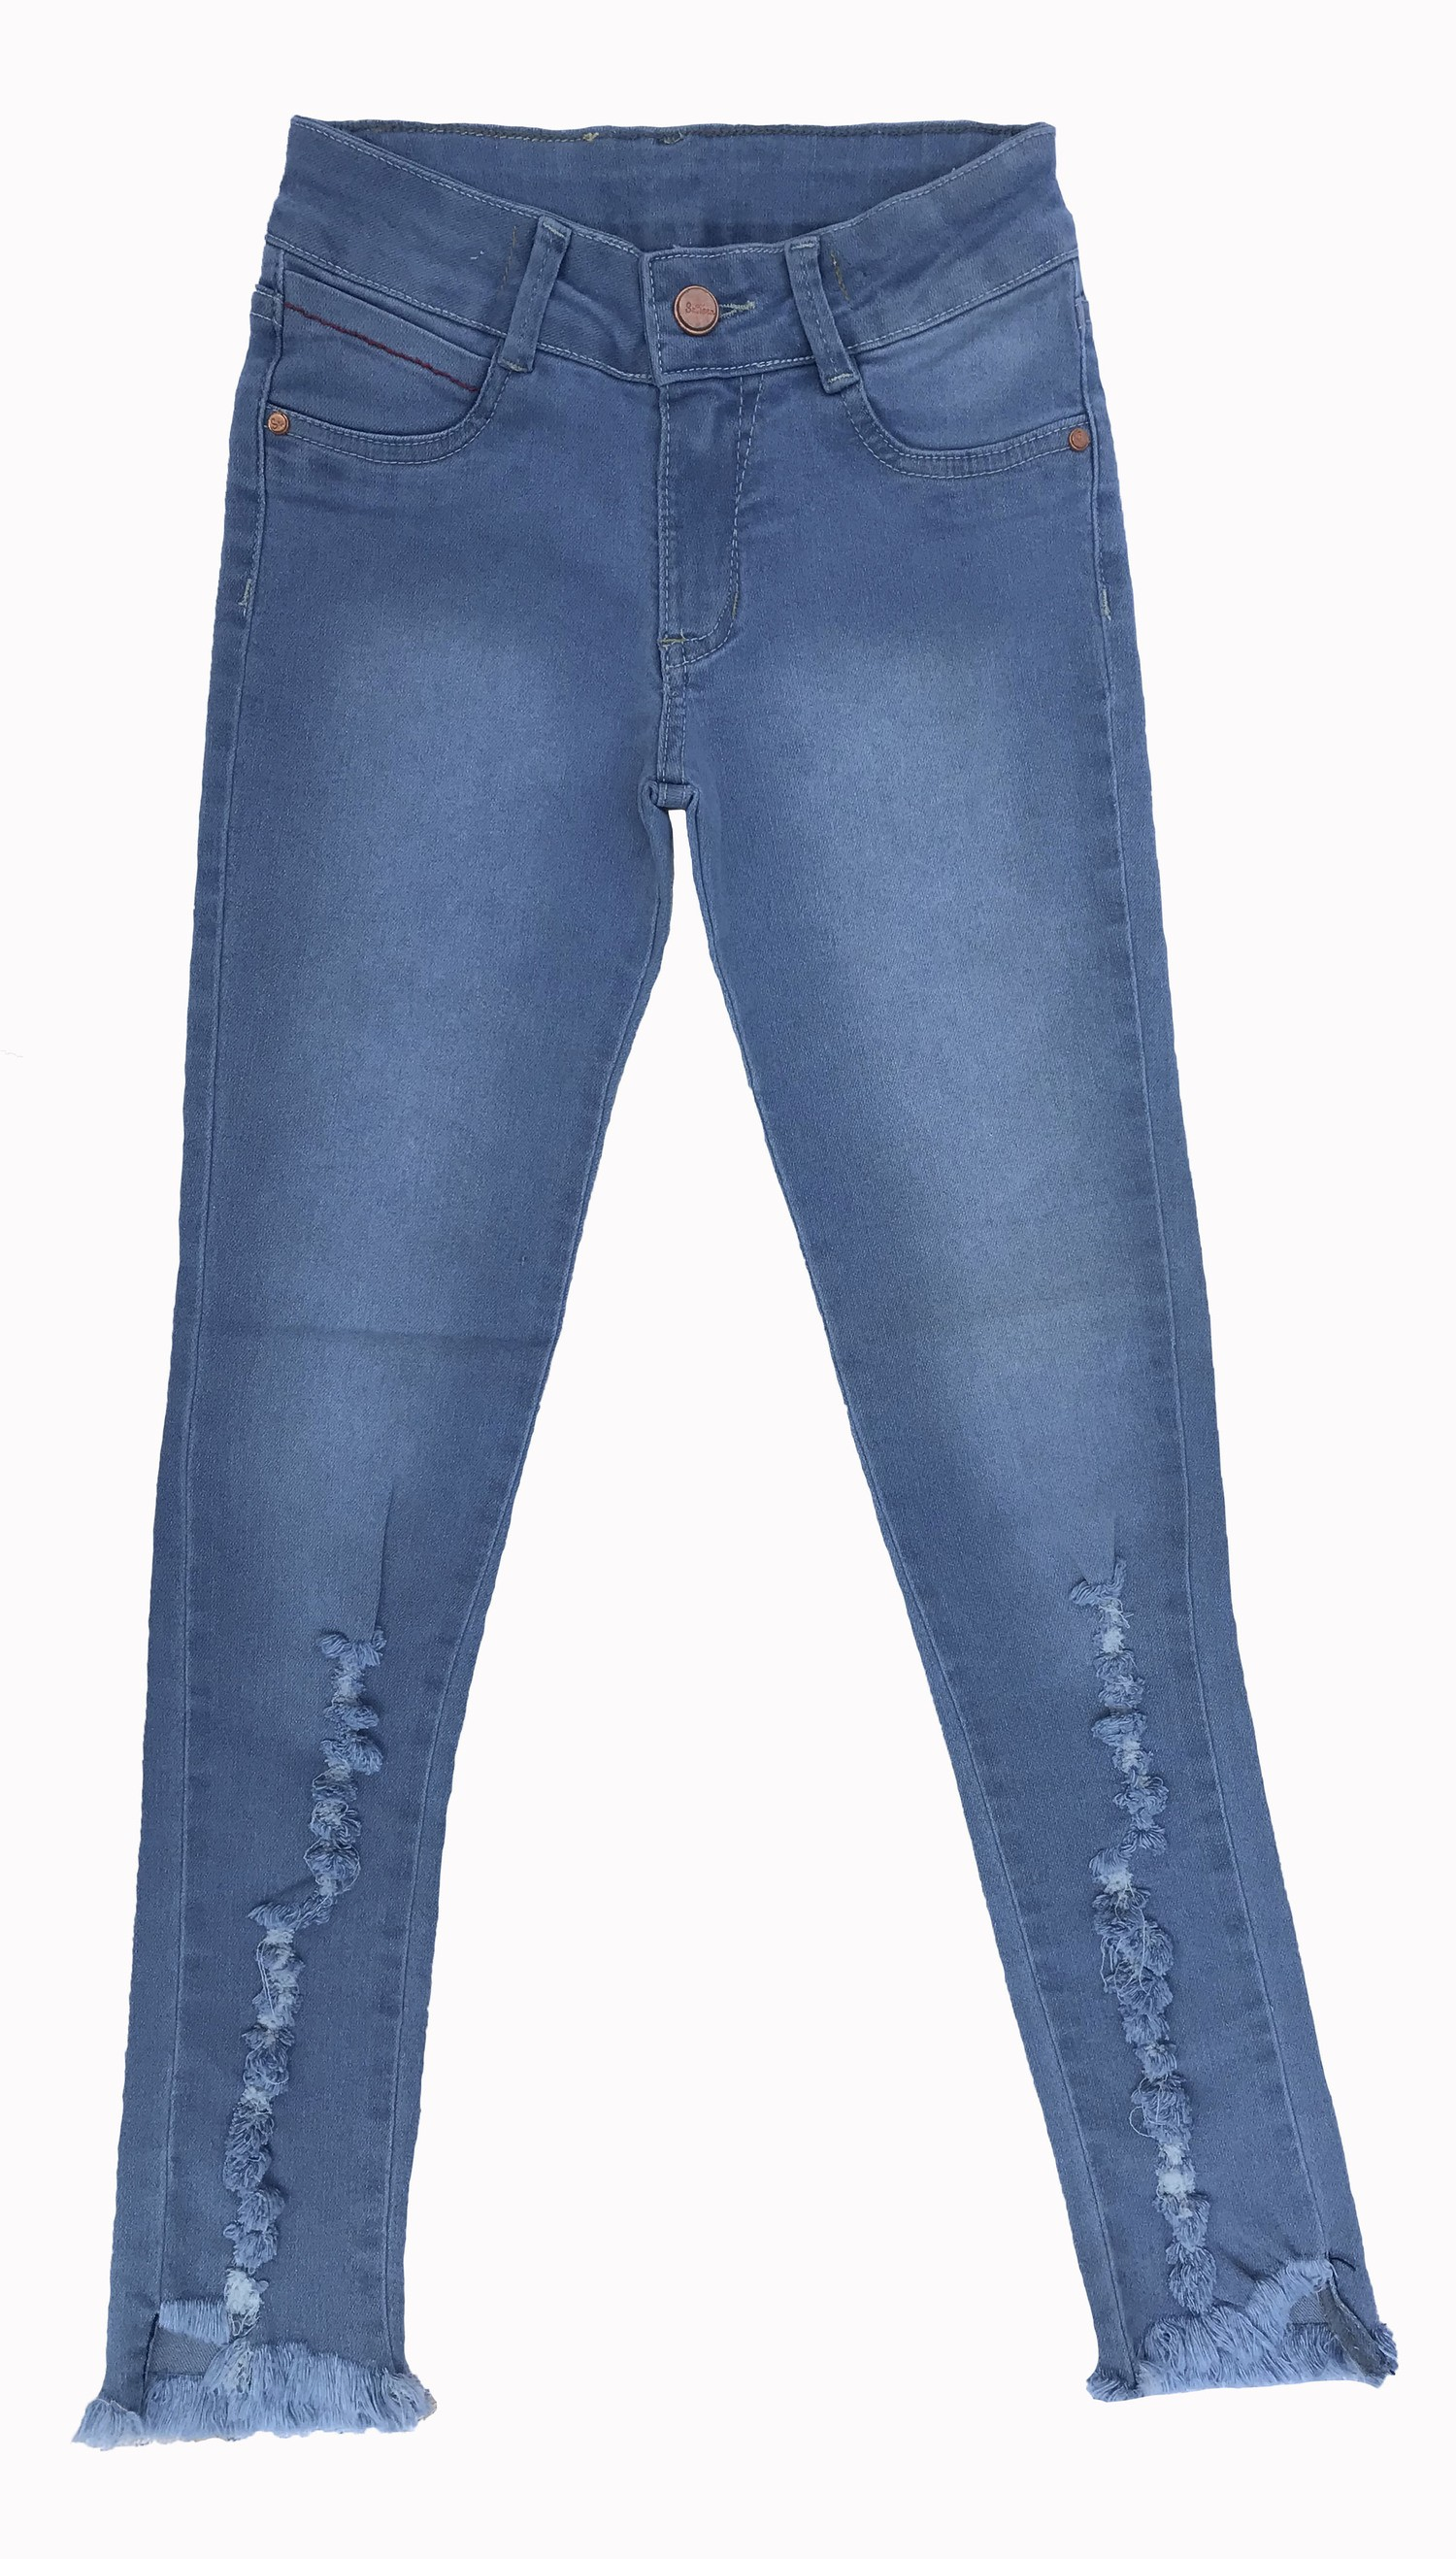 Calça Jeans Feminina [608]